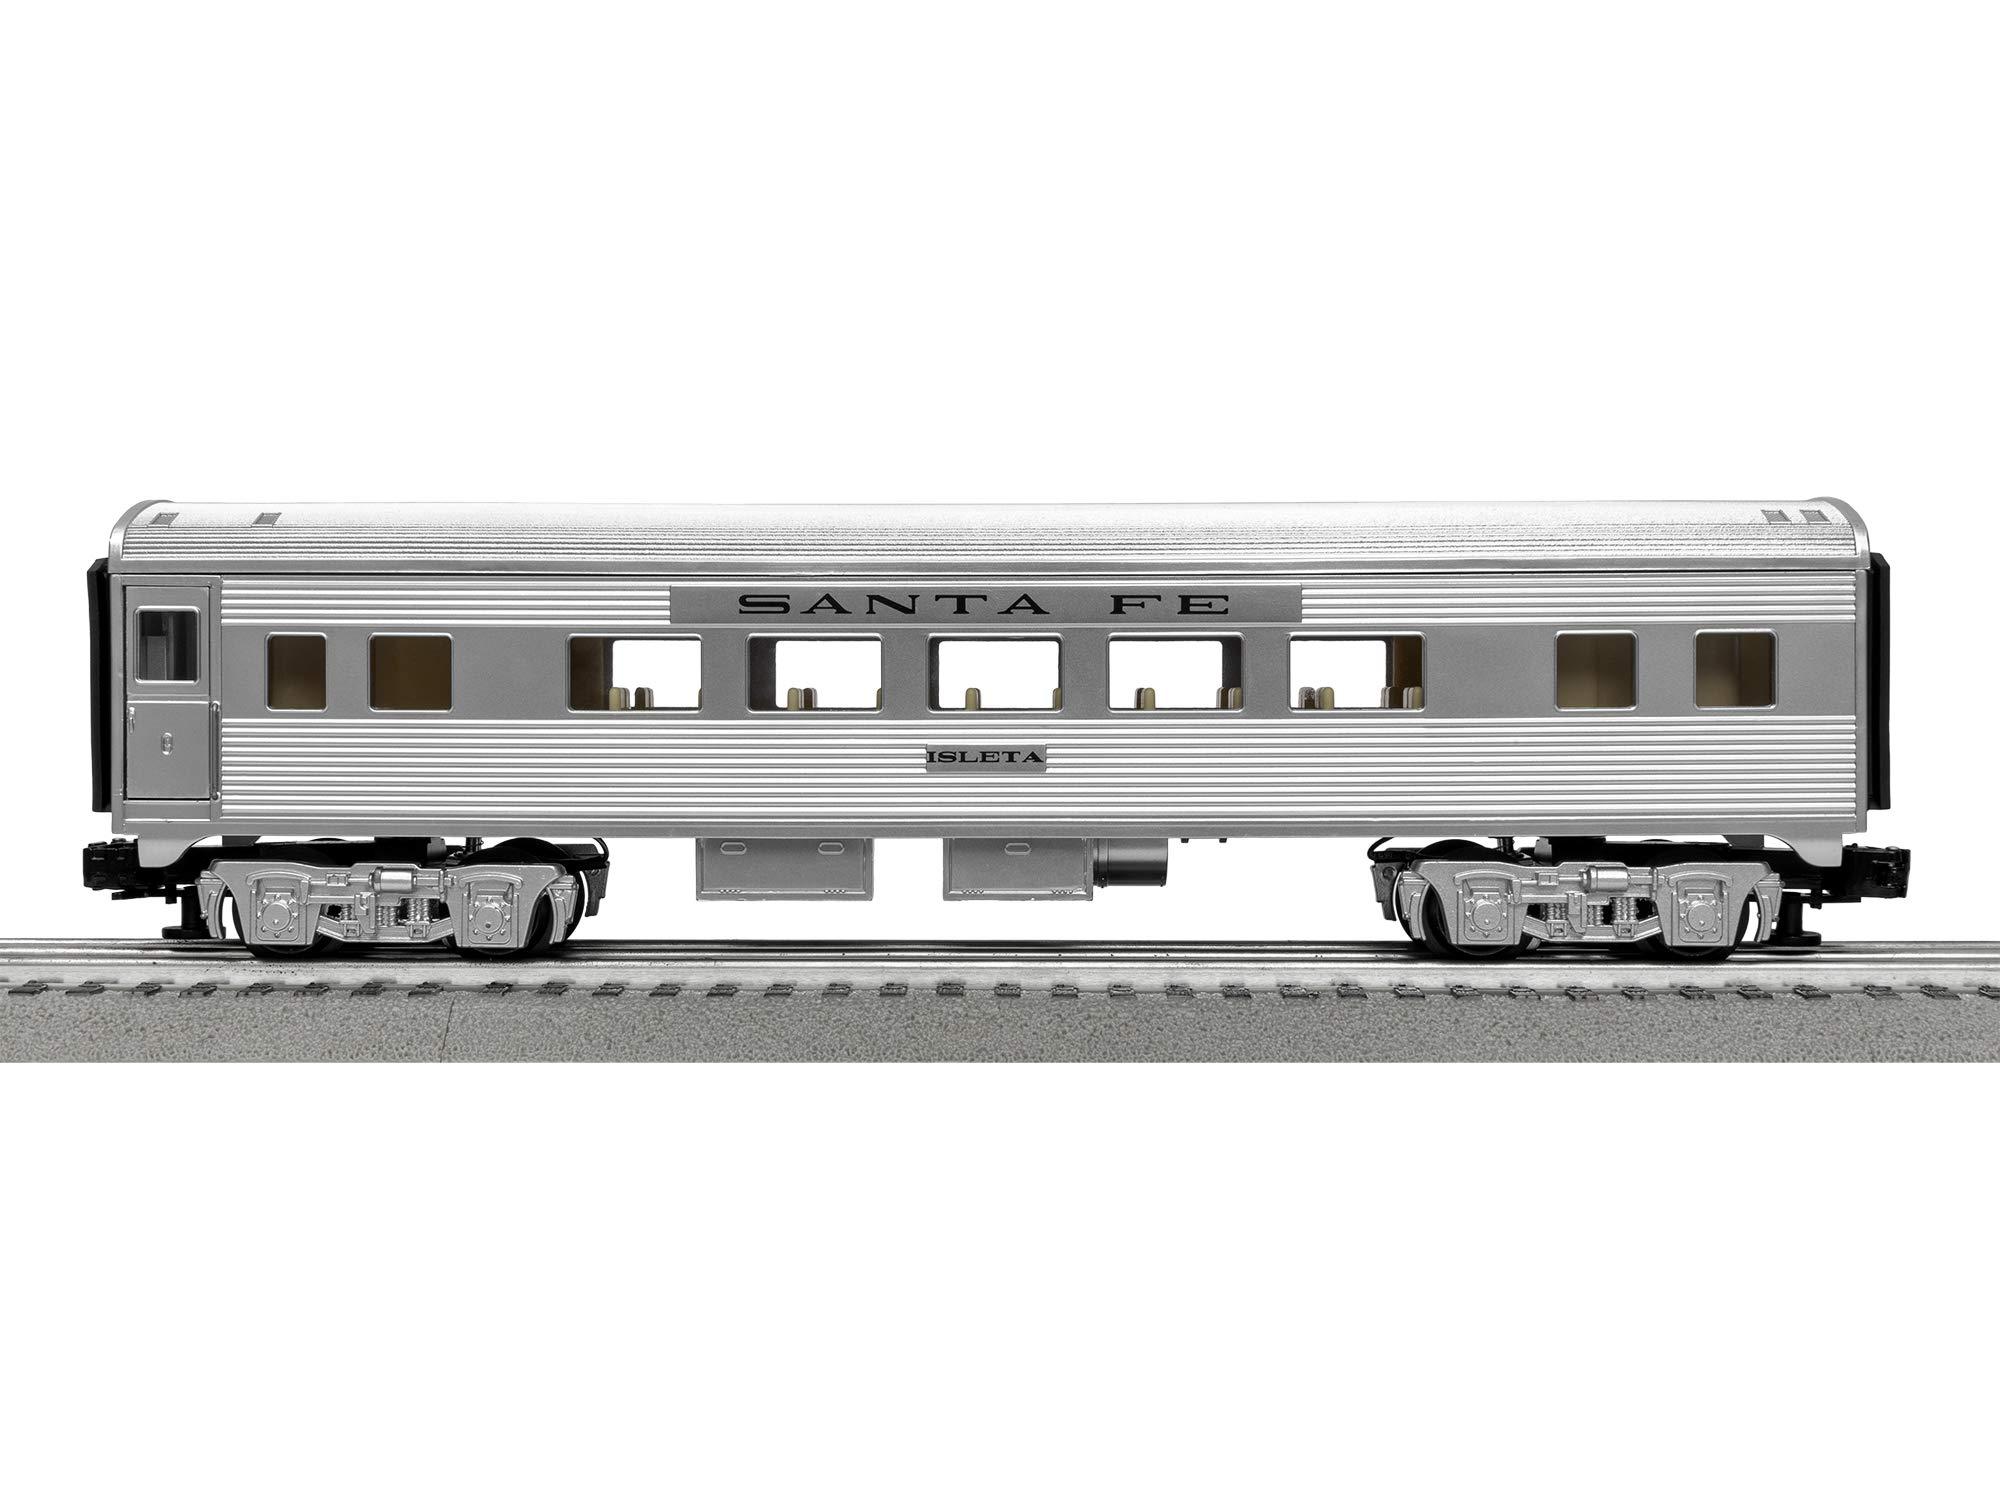 Lionel Santa Fe Super Chief Electric O Gauge Model Train Set w/ Remote and Bluetooth Capability by Lionel (Image #8)